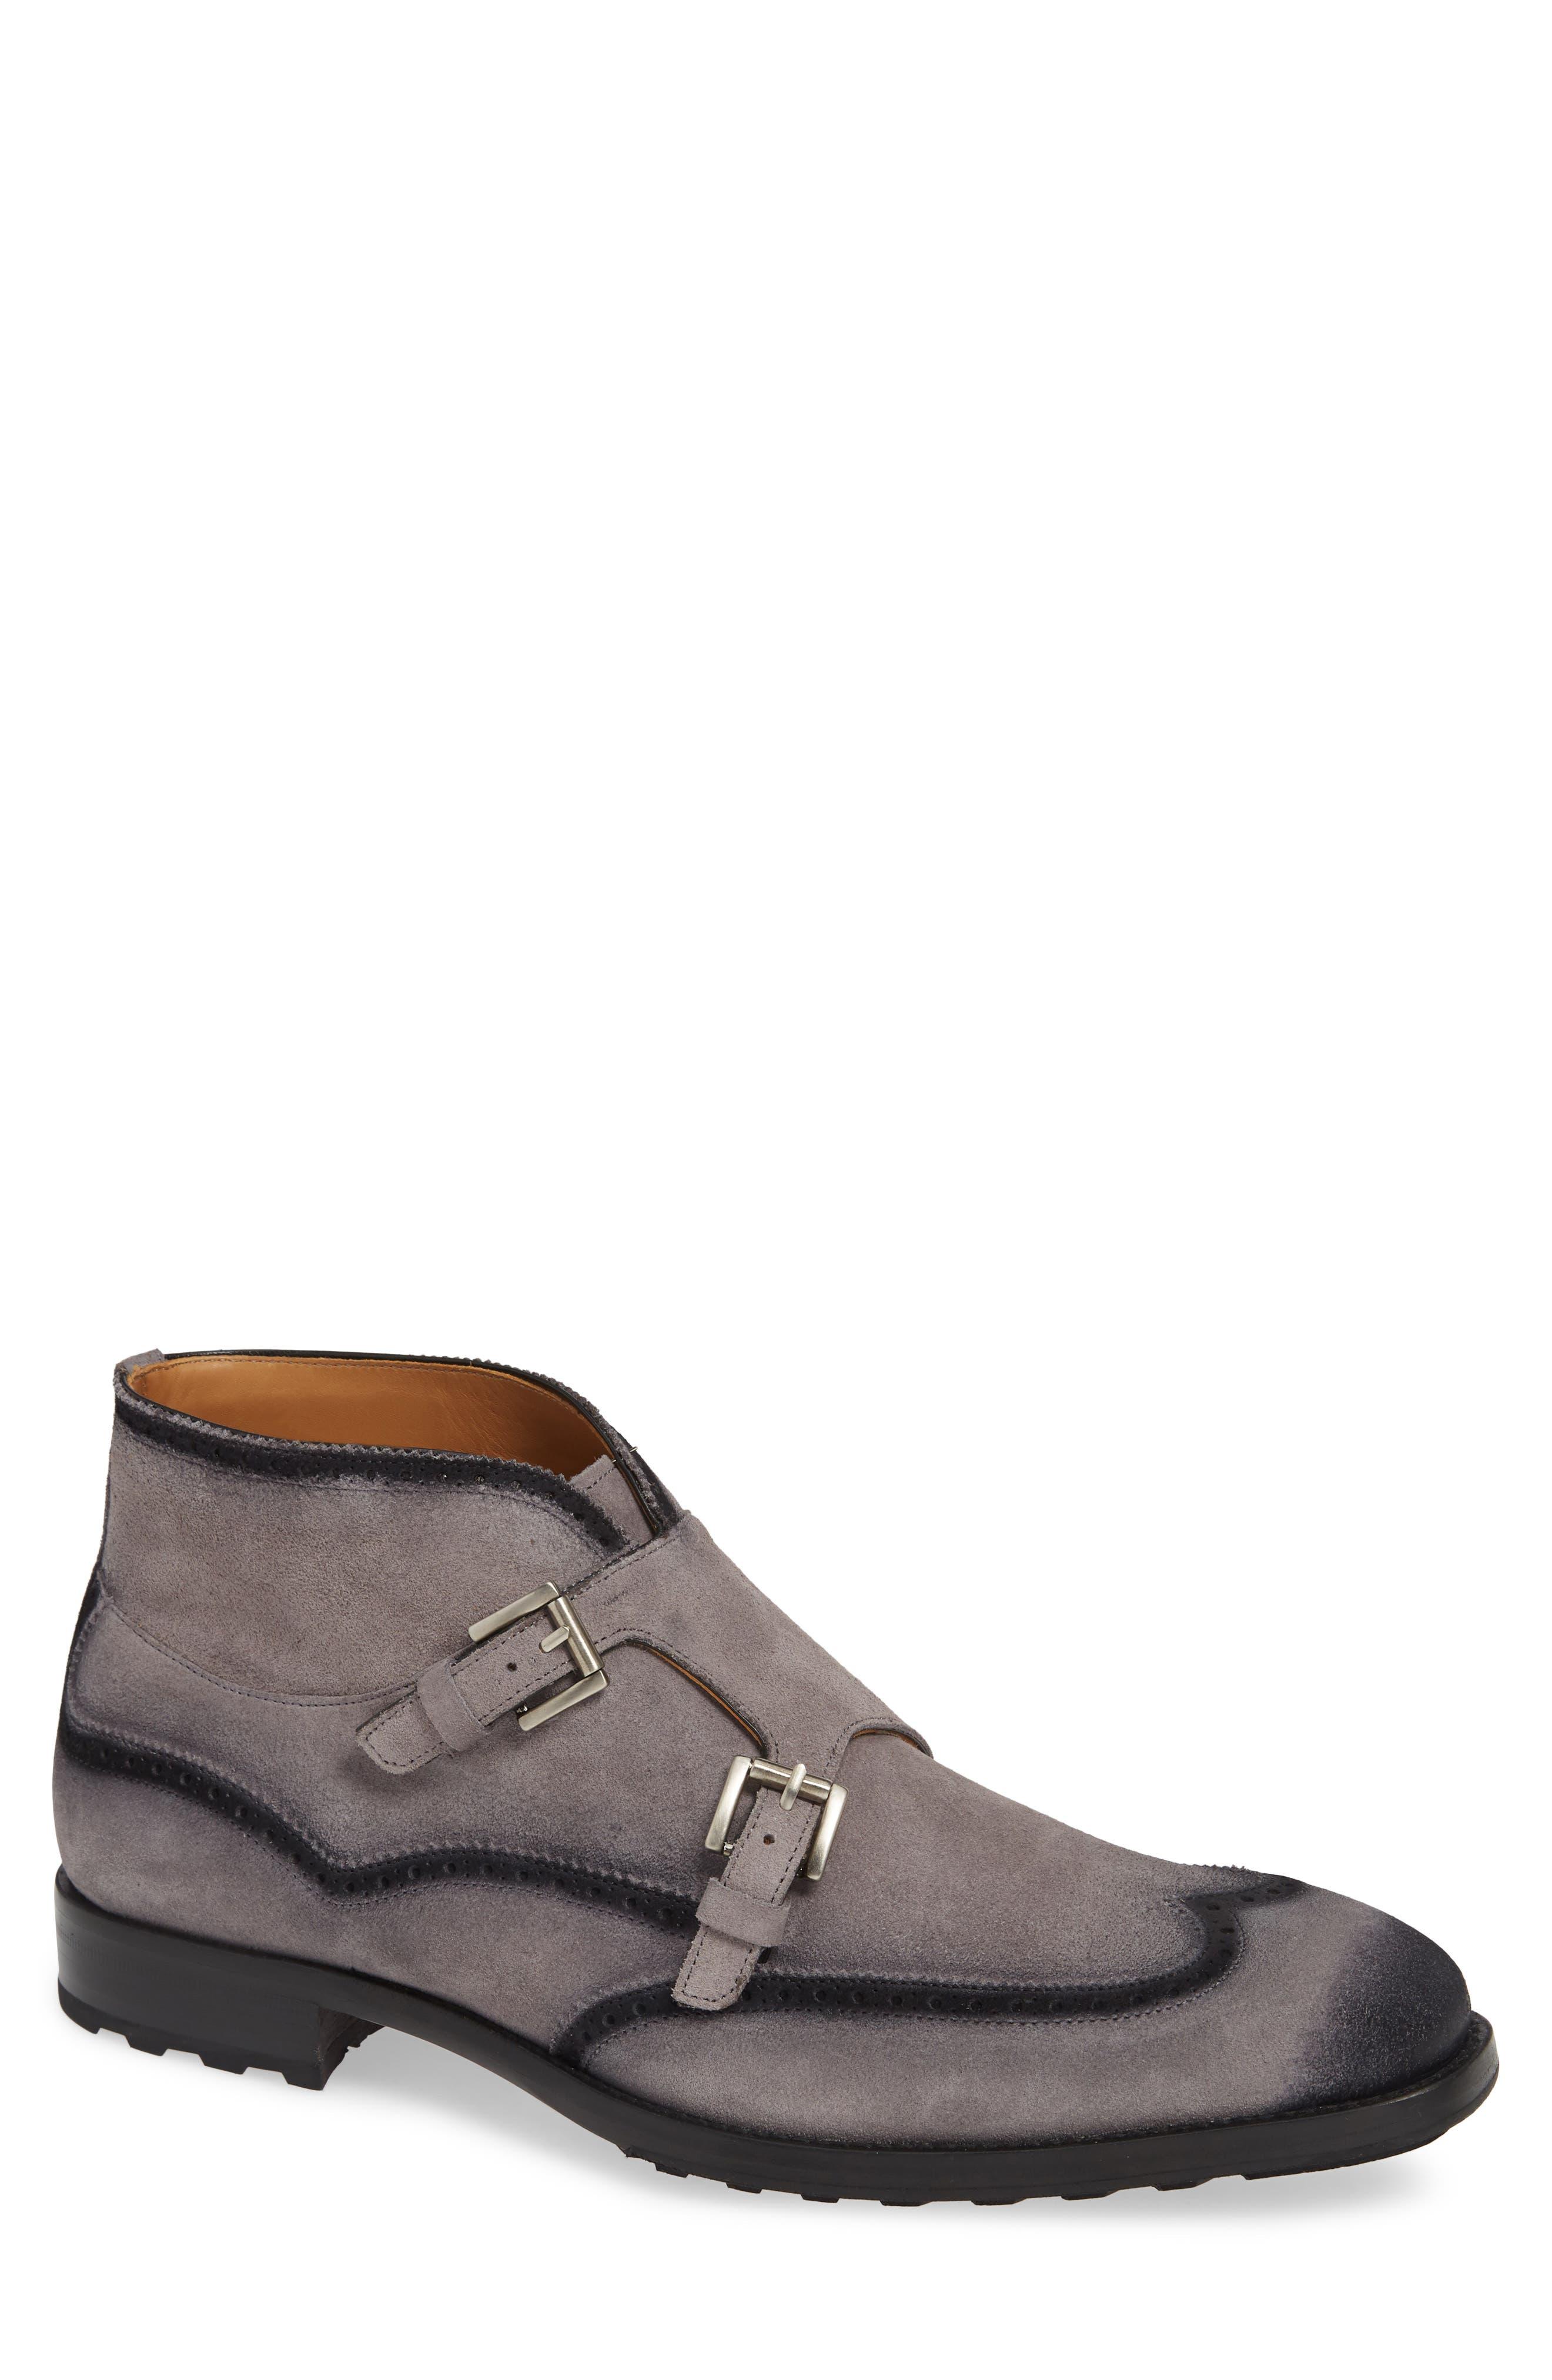 Munoz Double Monk Strap Boot,                         Main,                         color, GREY SUEDE